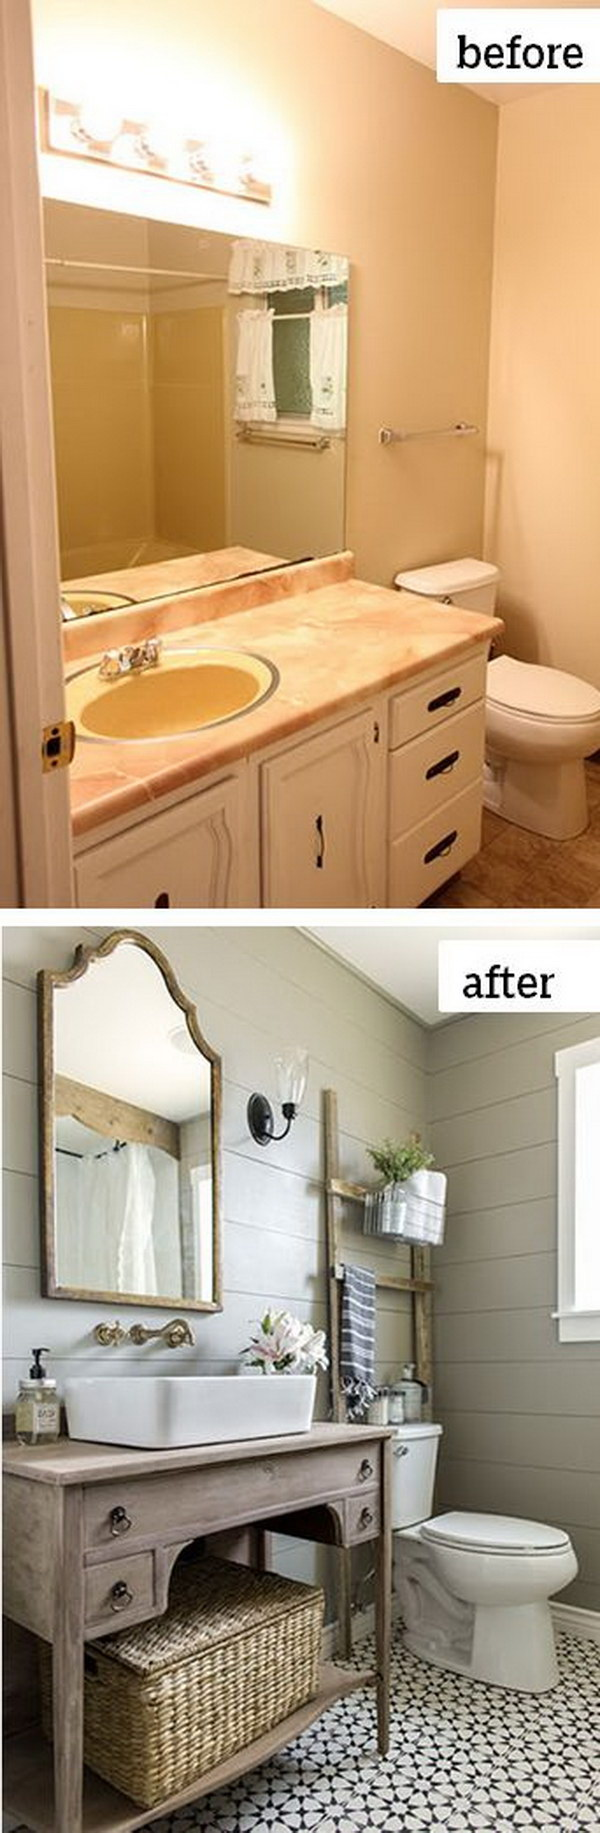 1-bathroom-remodeling-ideas